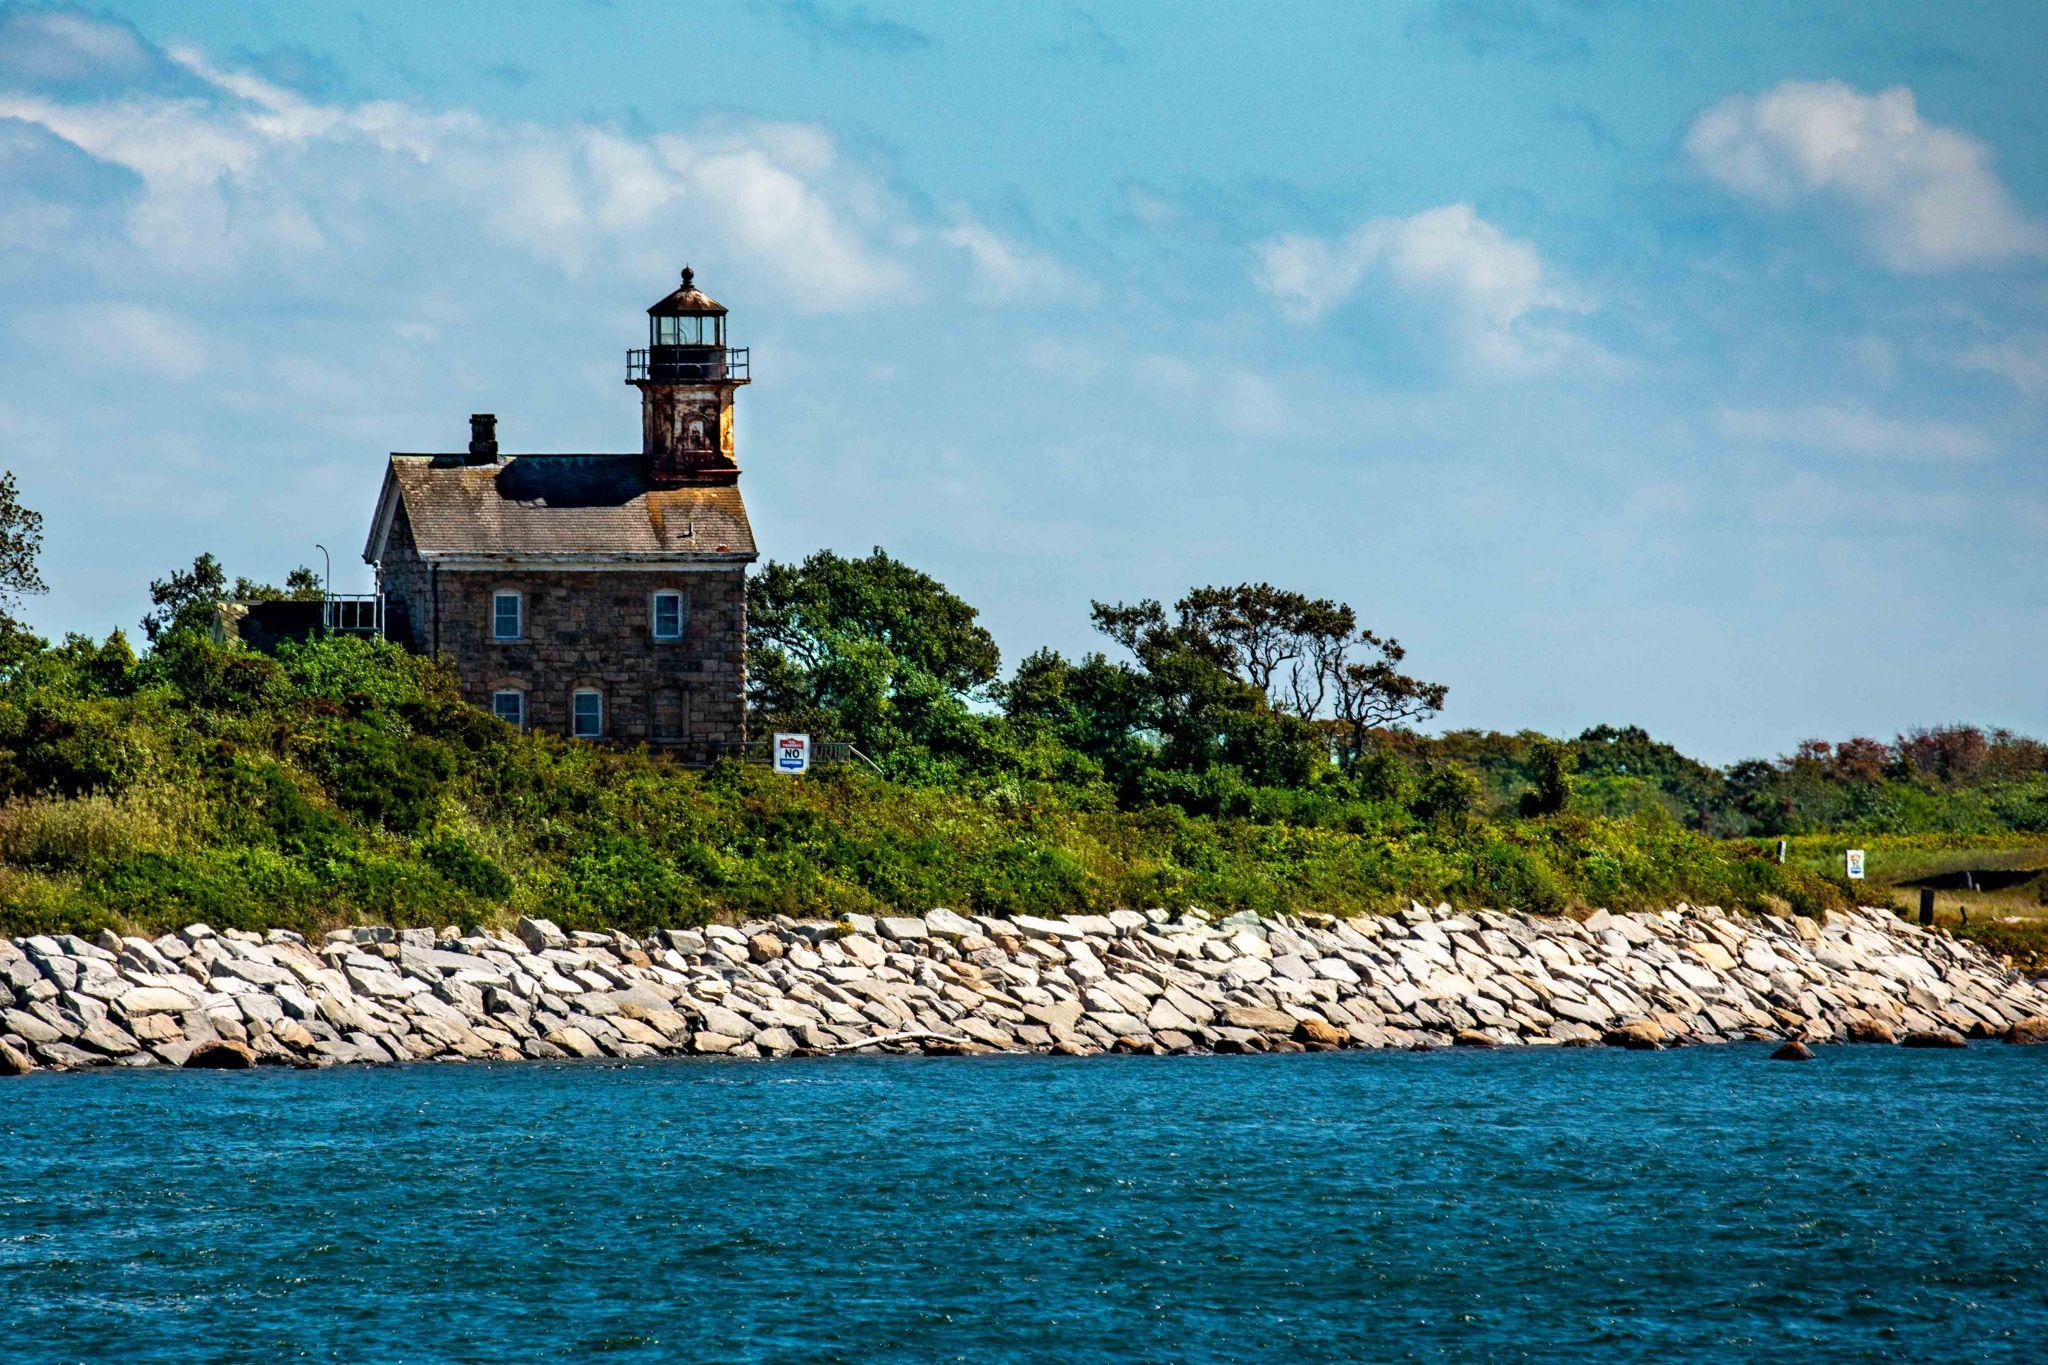 Plum Island Lighthouse, Plum Island, USA